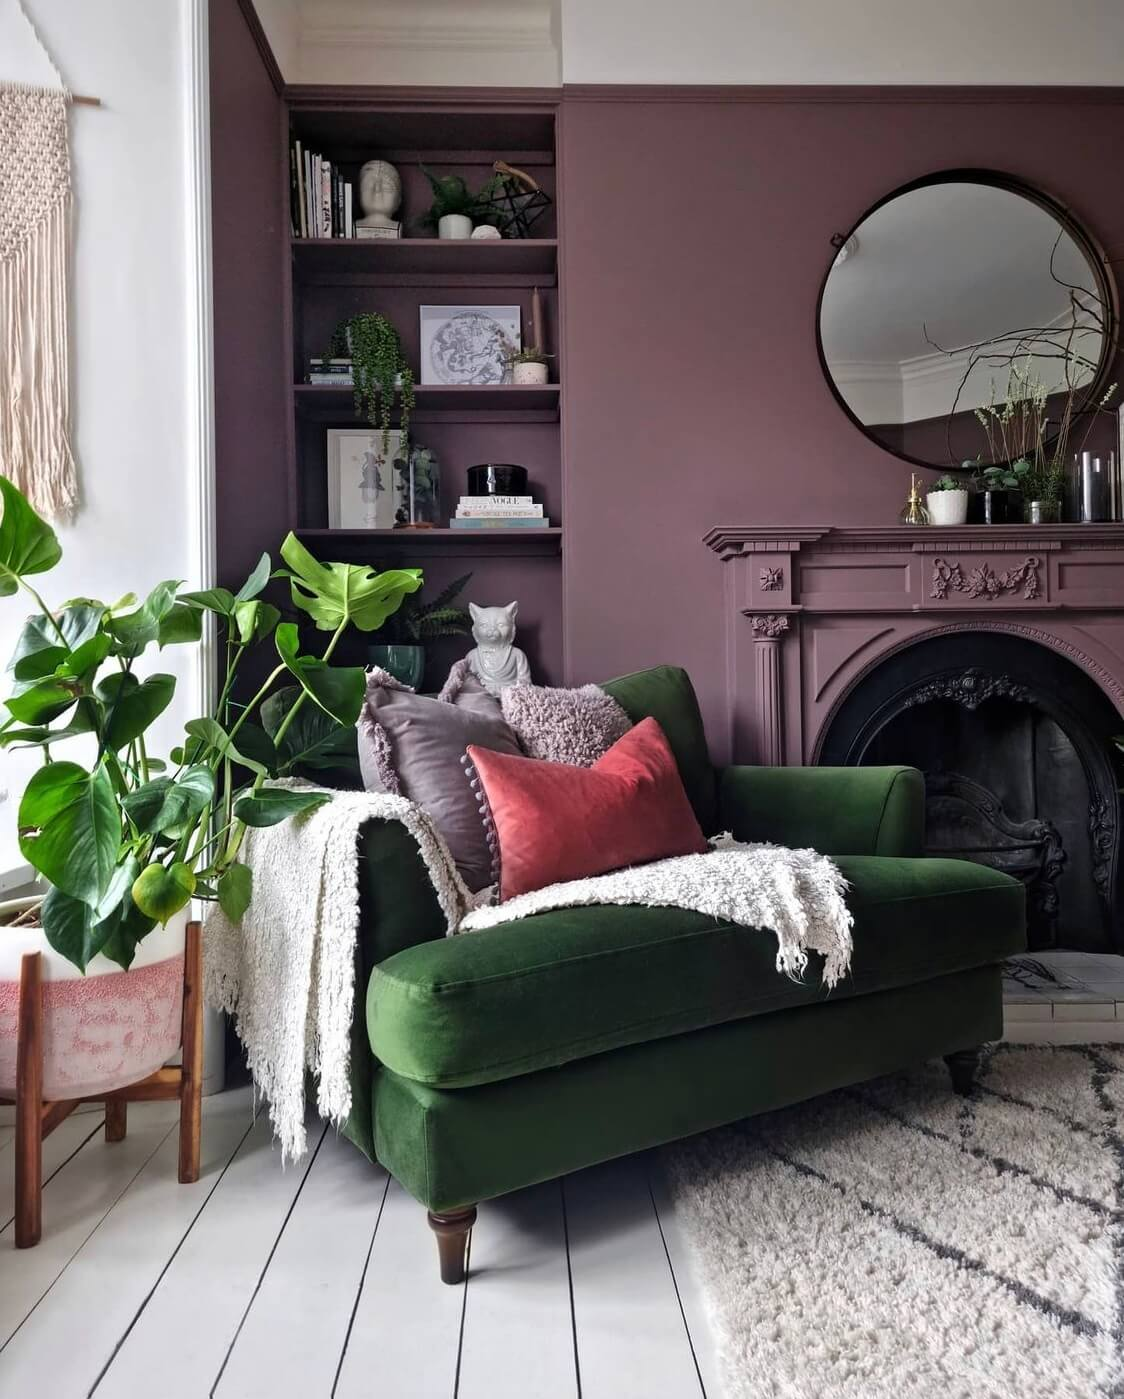 green-velvet-armchair-purple-living-room-nordroom